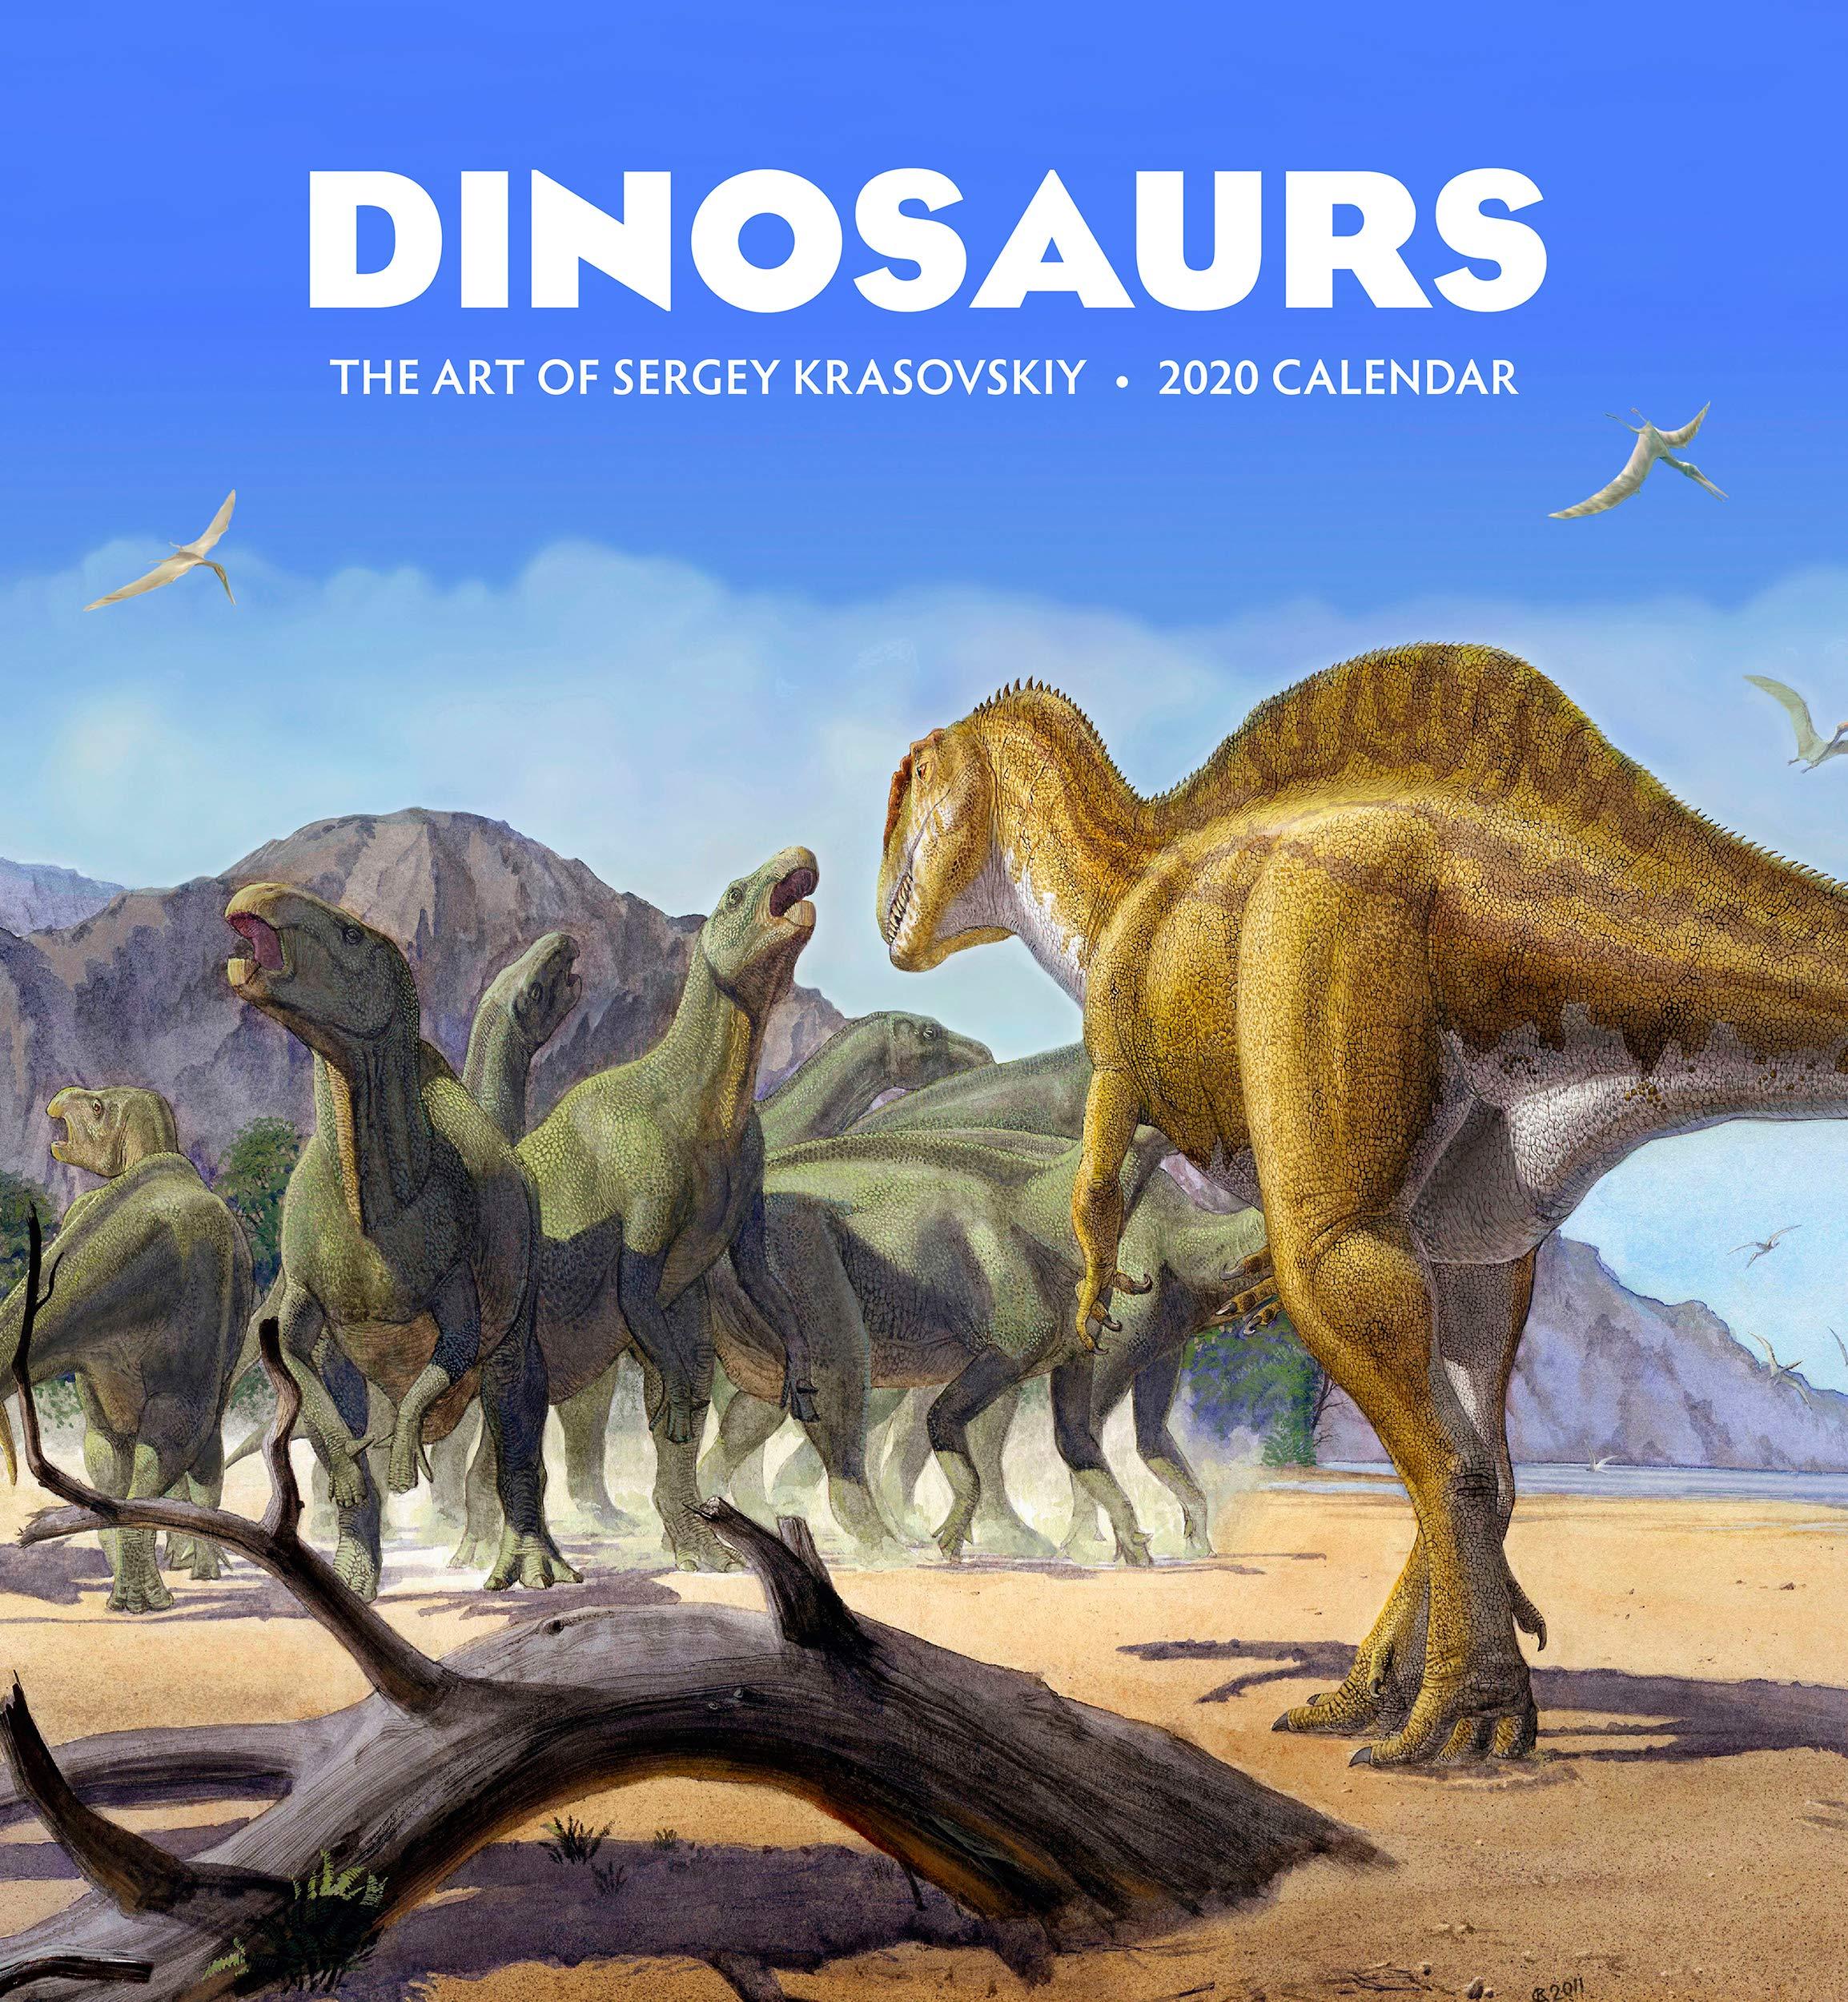 Dinosaurs: The Art of Sergey Krasovskiy 2020 Wall Calendar by Pomegranate